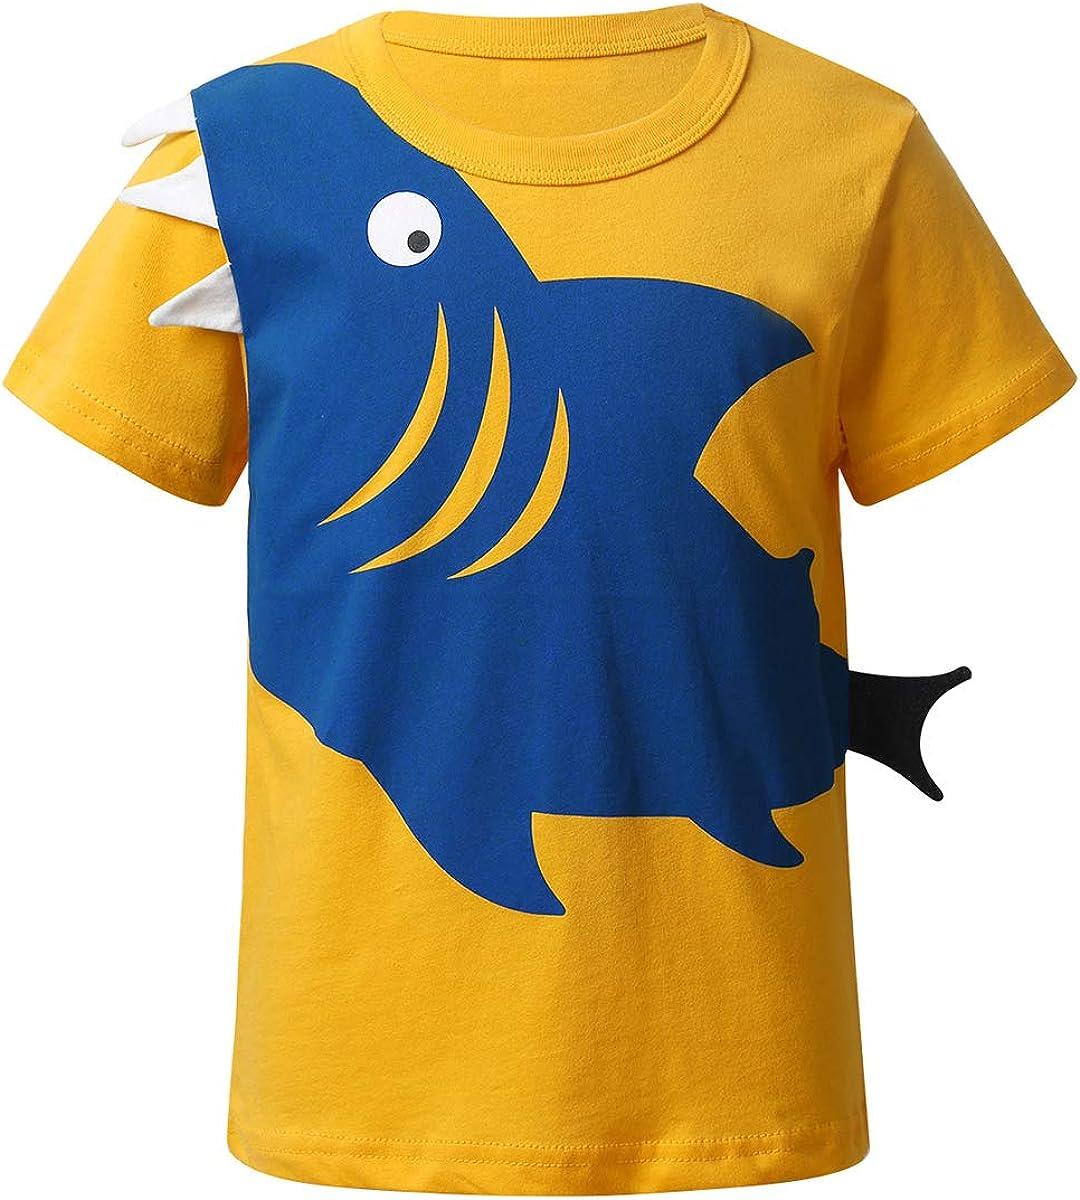 MSemis Kids Boys Shark Short Sleeve T Shirts Cotton Tank Top Summer Casual Wear Party Tees